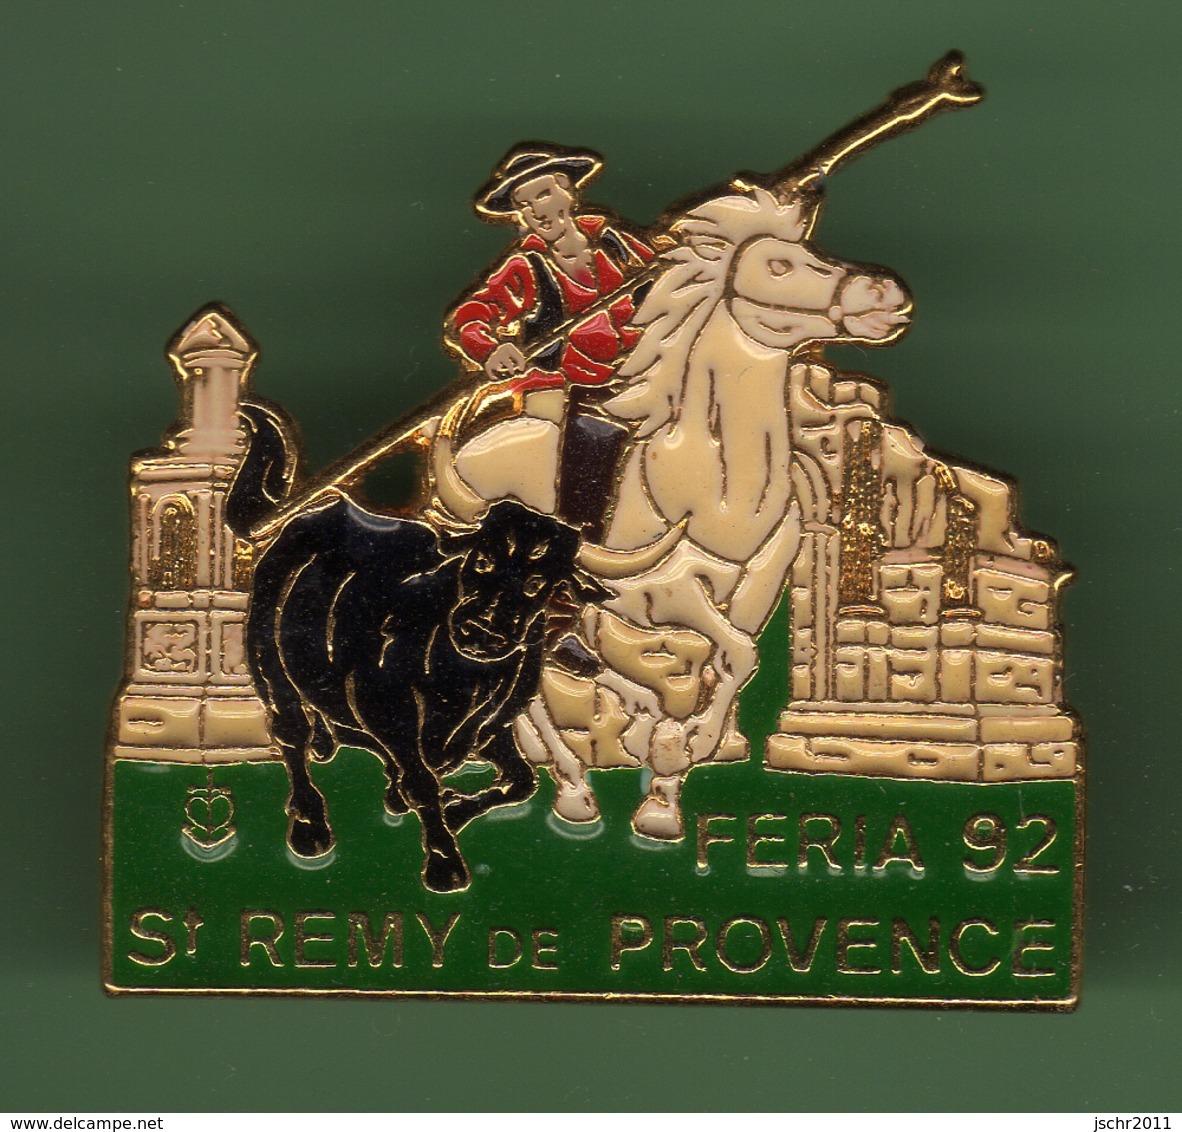 SAINT REMY DE PROVENCE *** FERIA 92 *** Signe ATLANTIS *** 0086 - Bullfight - Corrida